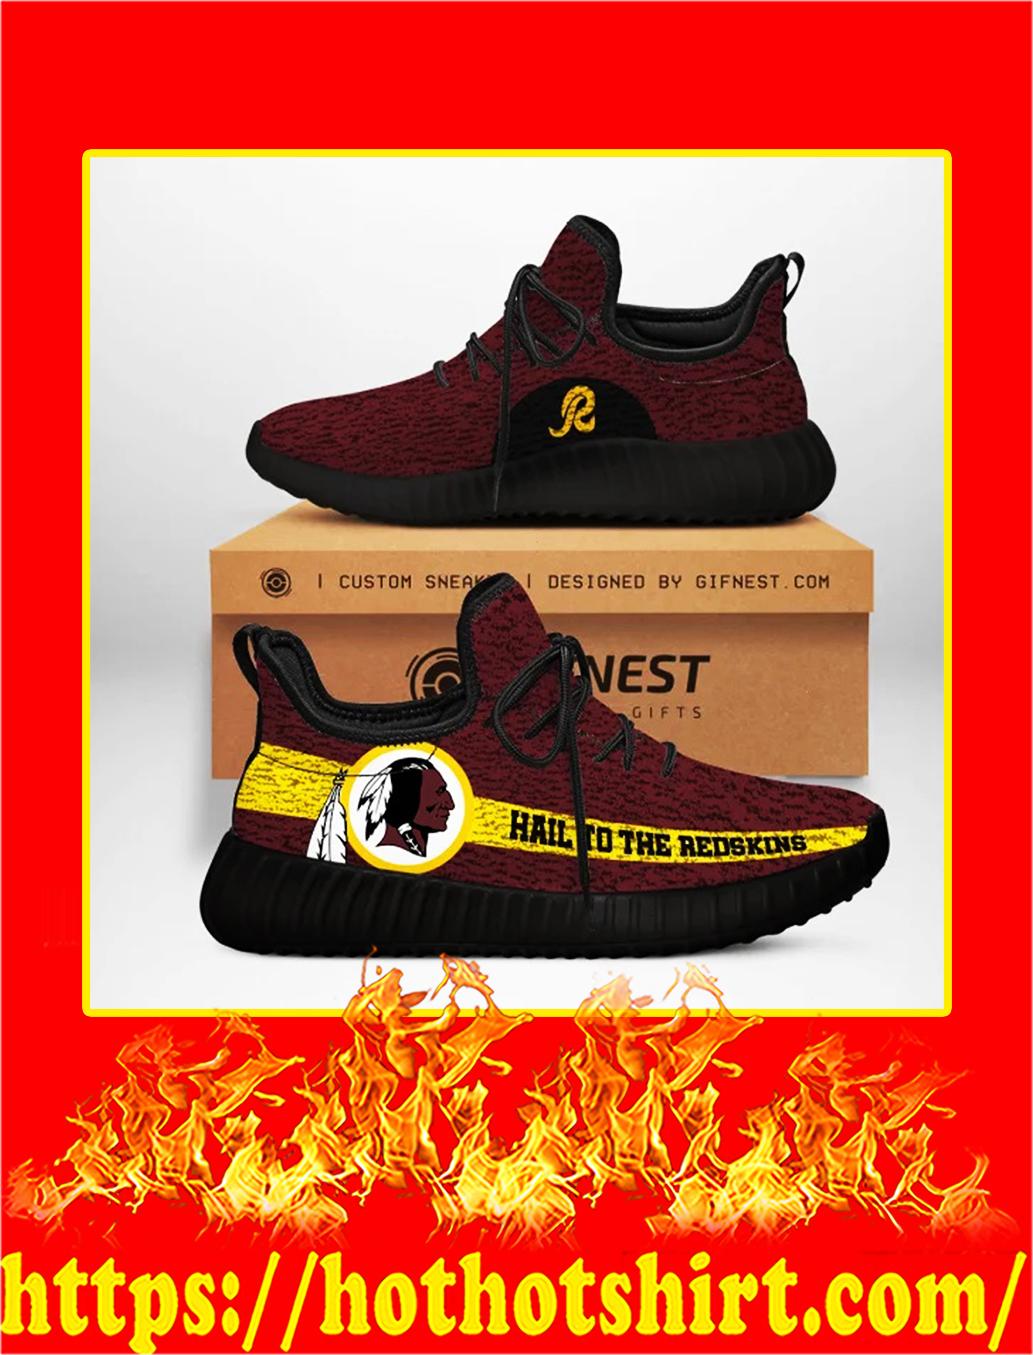 Hail To The Redskins Washington Redskins NFL Yeezy Sneaker - white